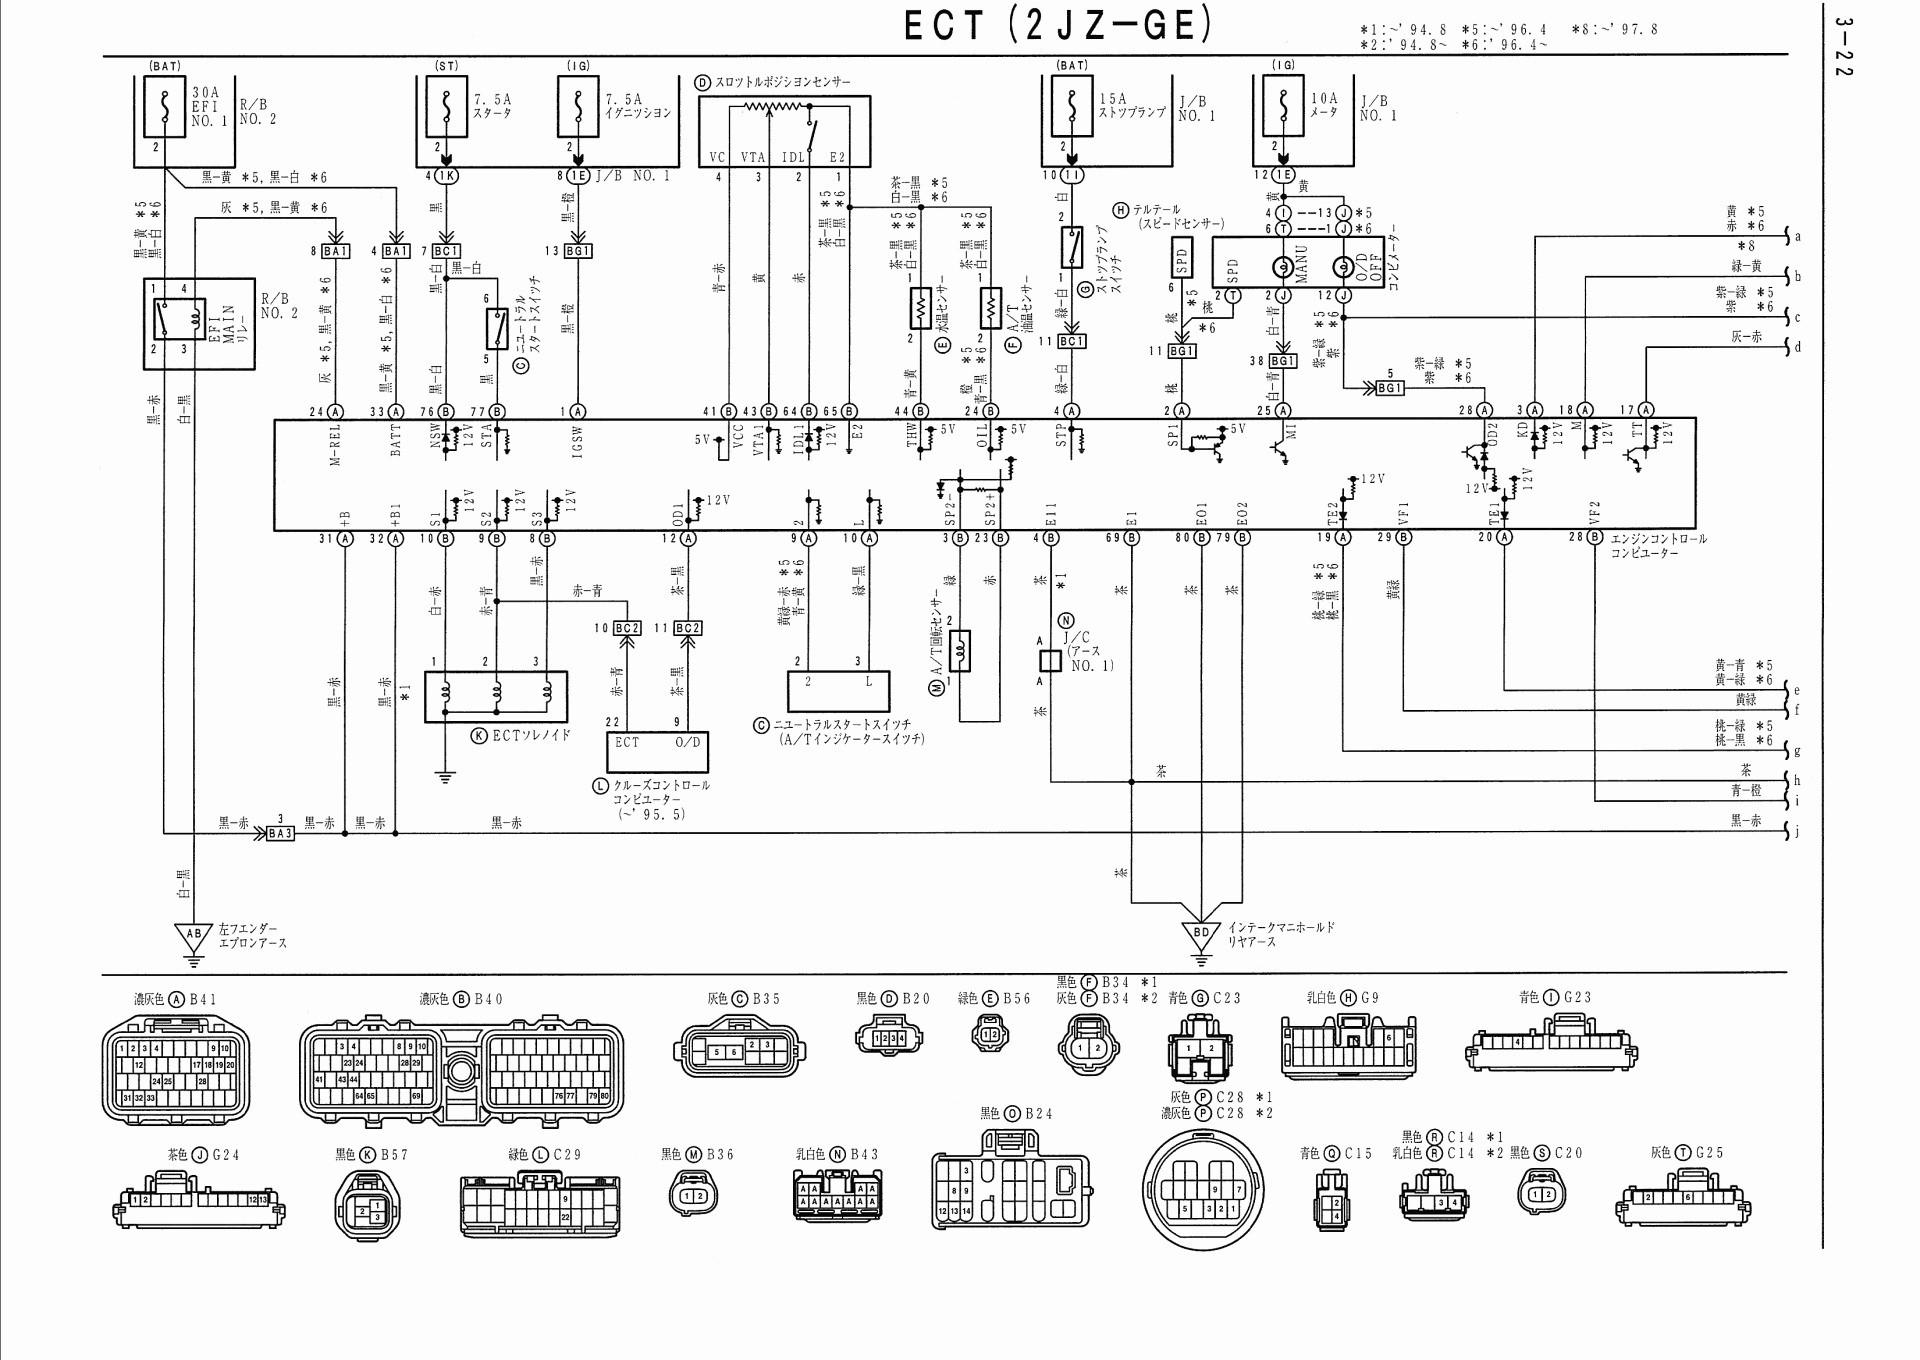 bmw m50 wiring diagram wiring diagrams Bmw M50 Engine Harness Connections Diagram m50 engine wiring diagram wiring